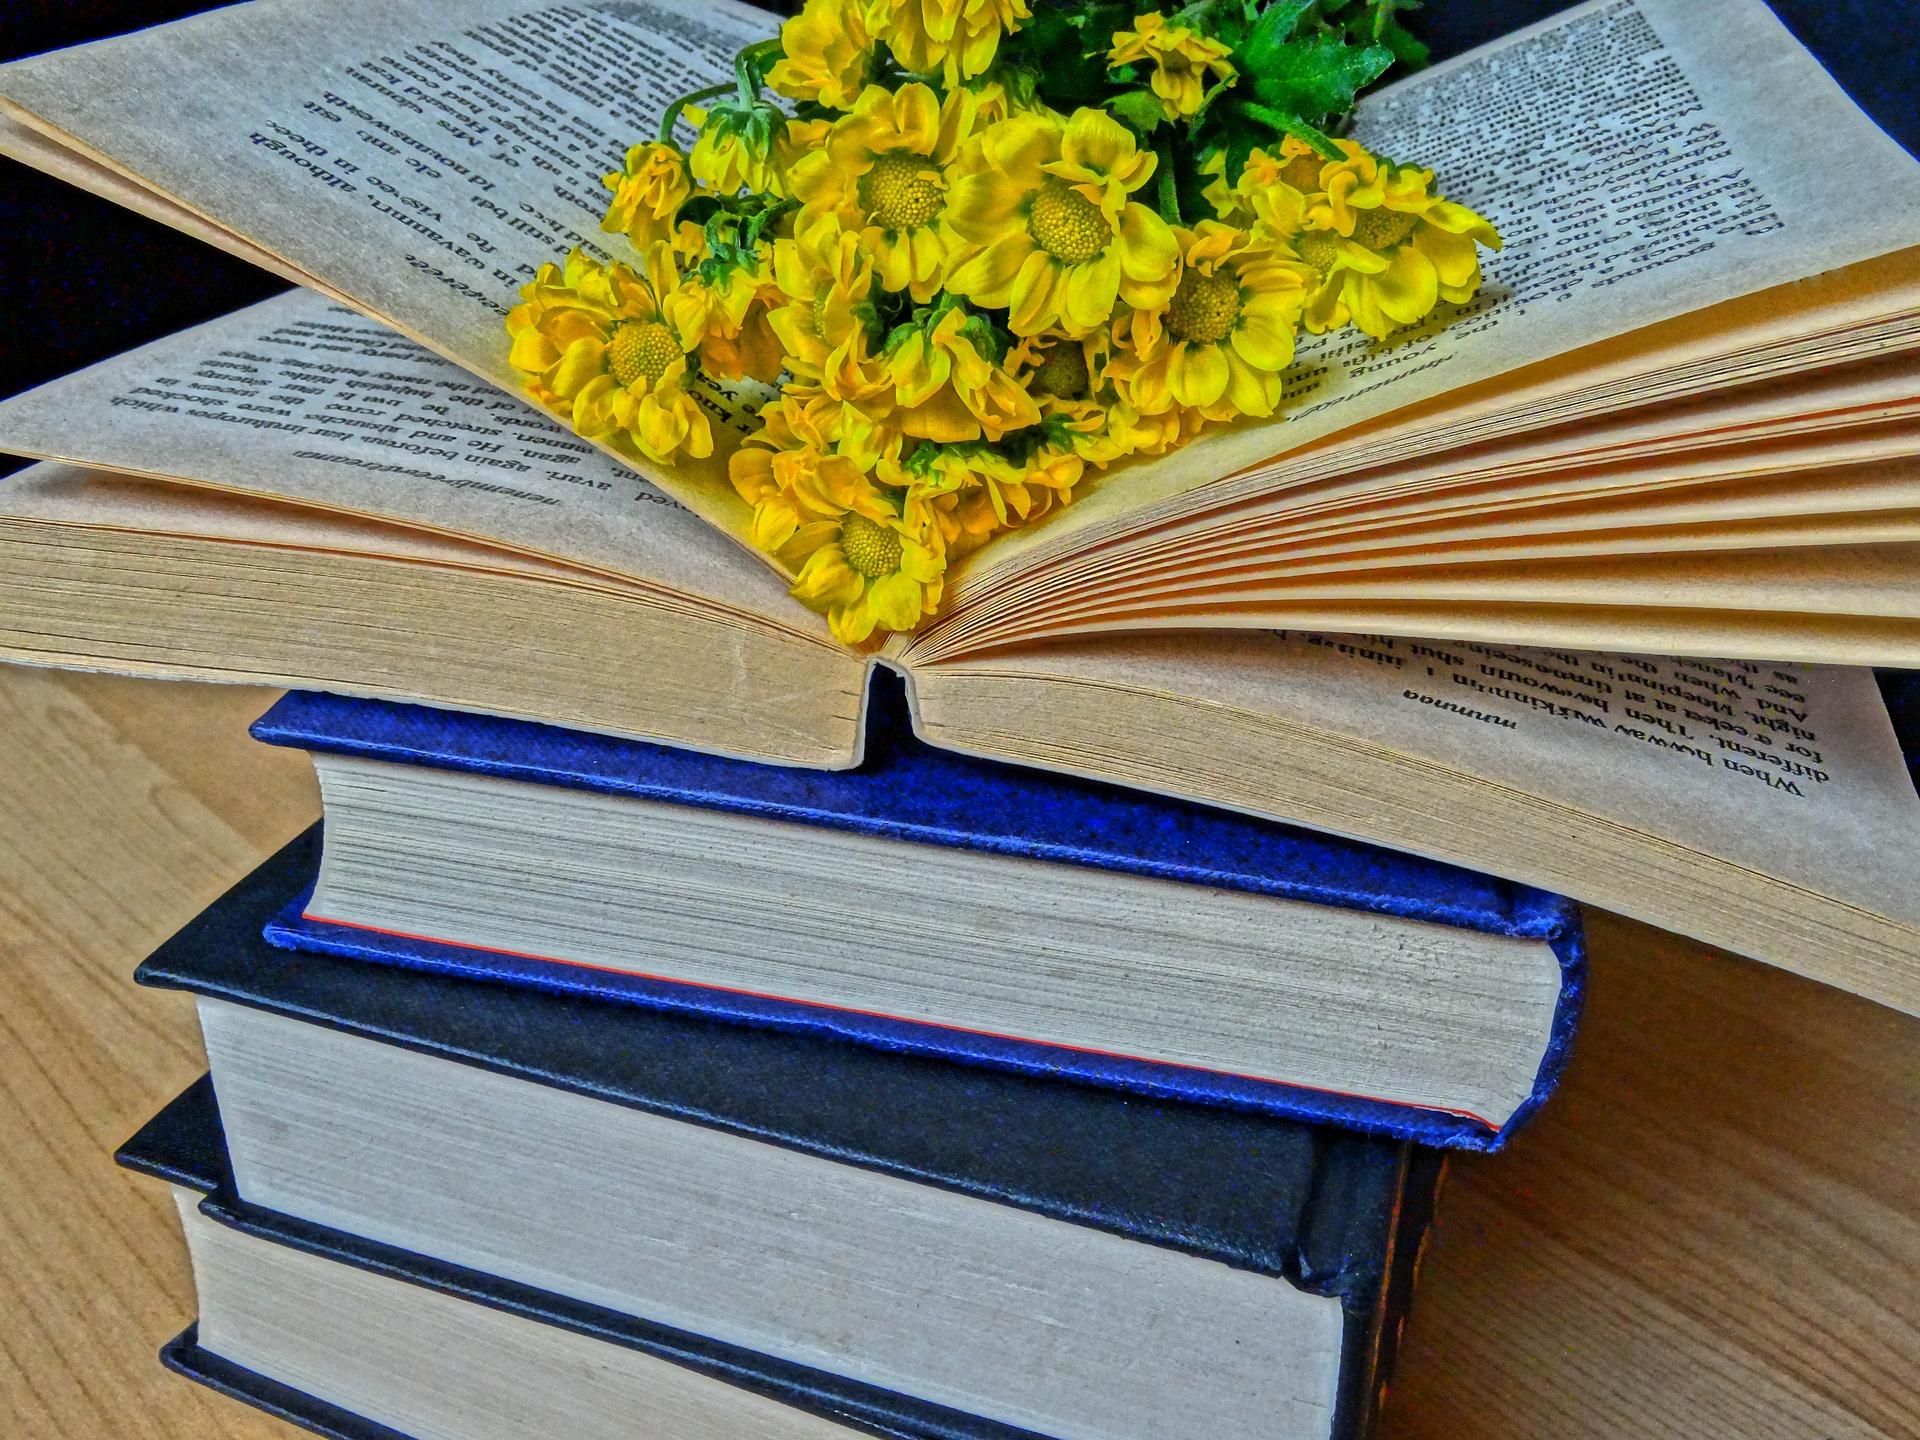 books-2565571_1920